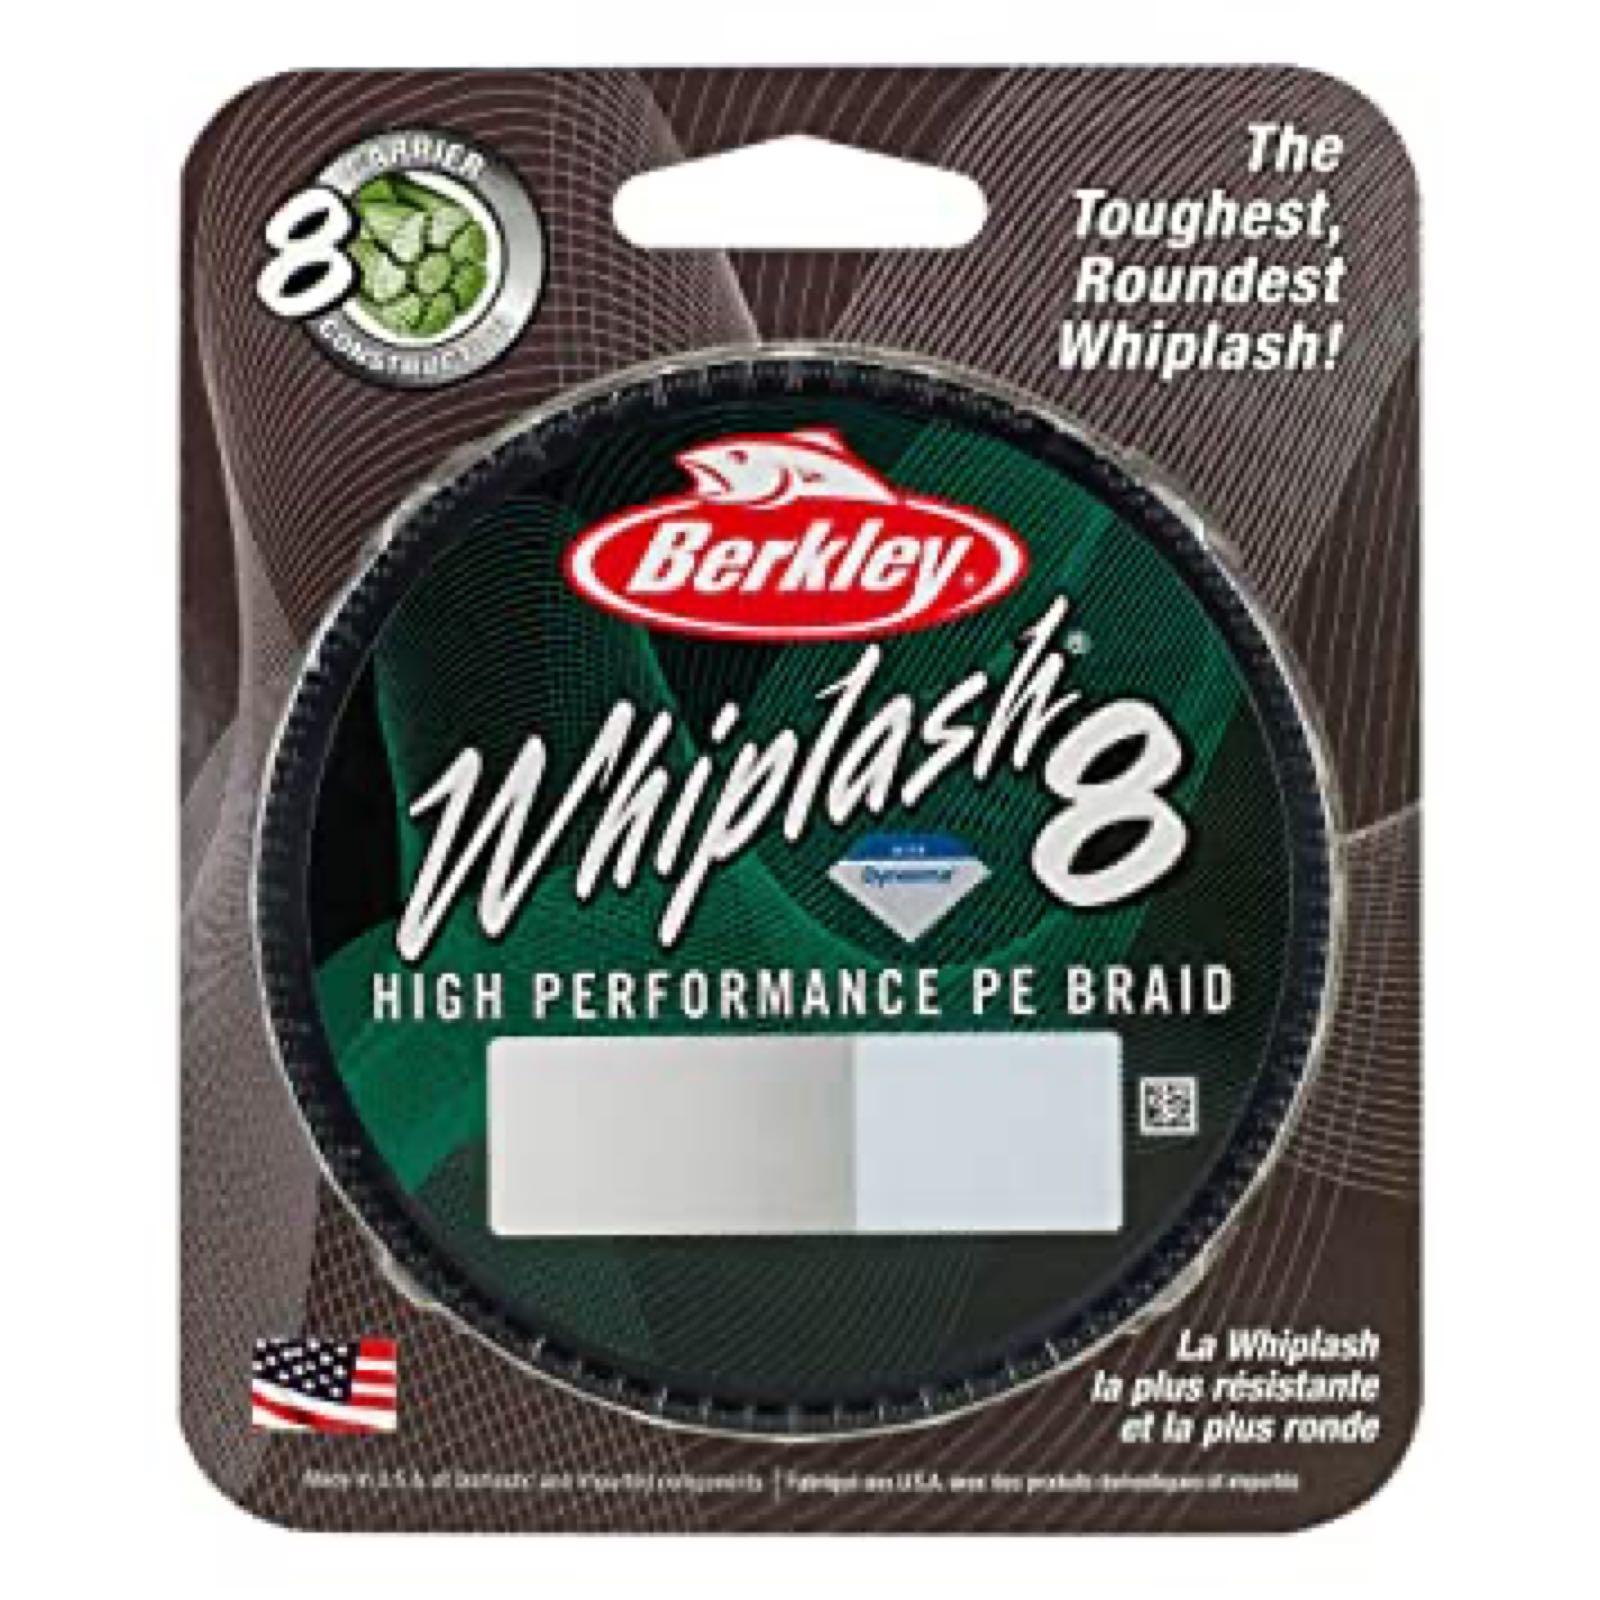 Berkley Whiplash 8 Crystal Braid